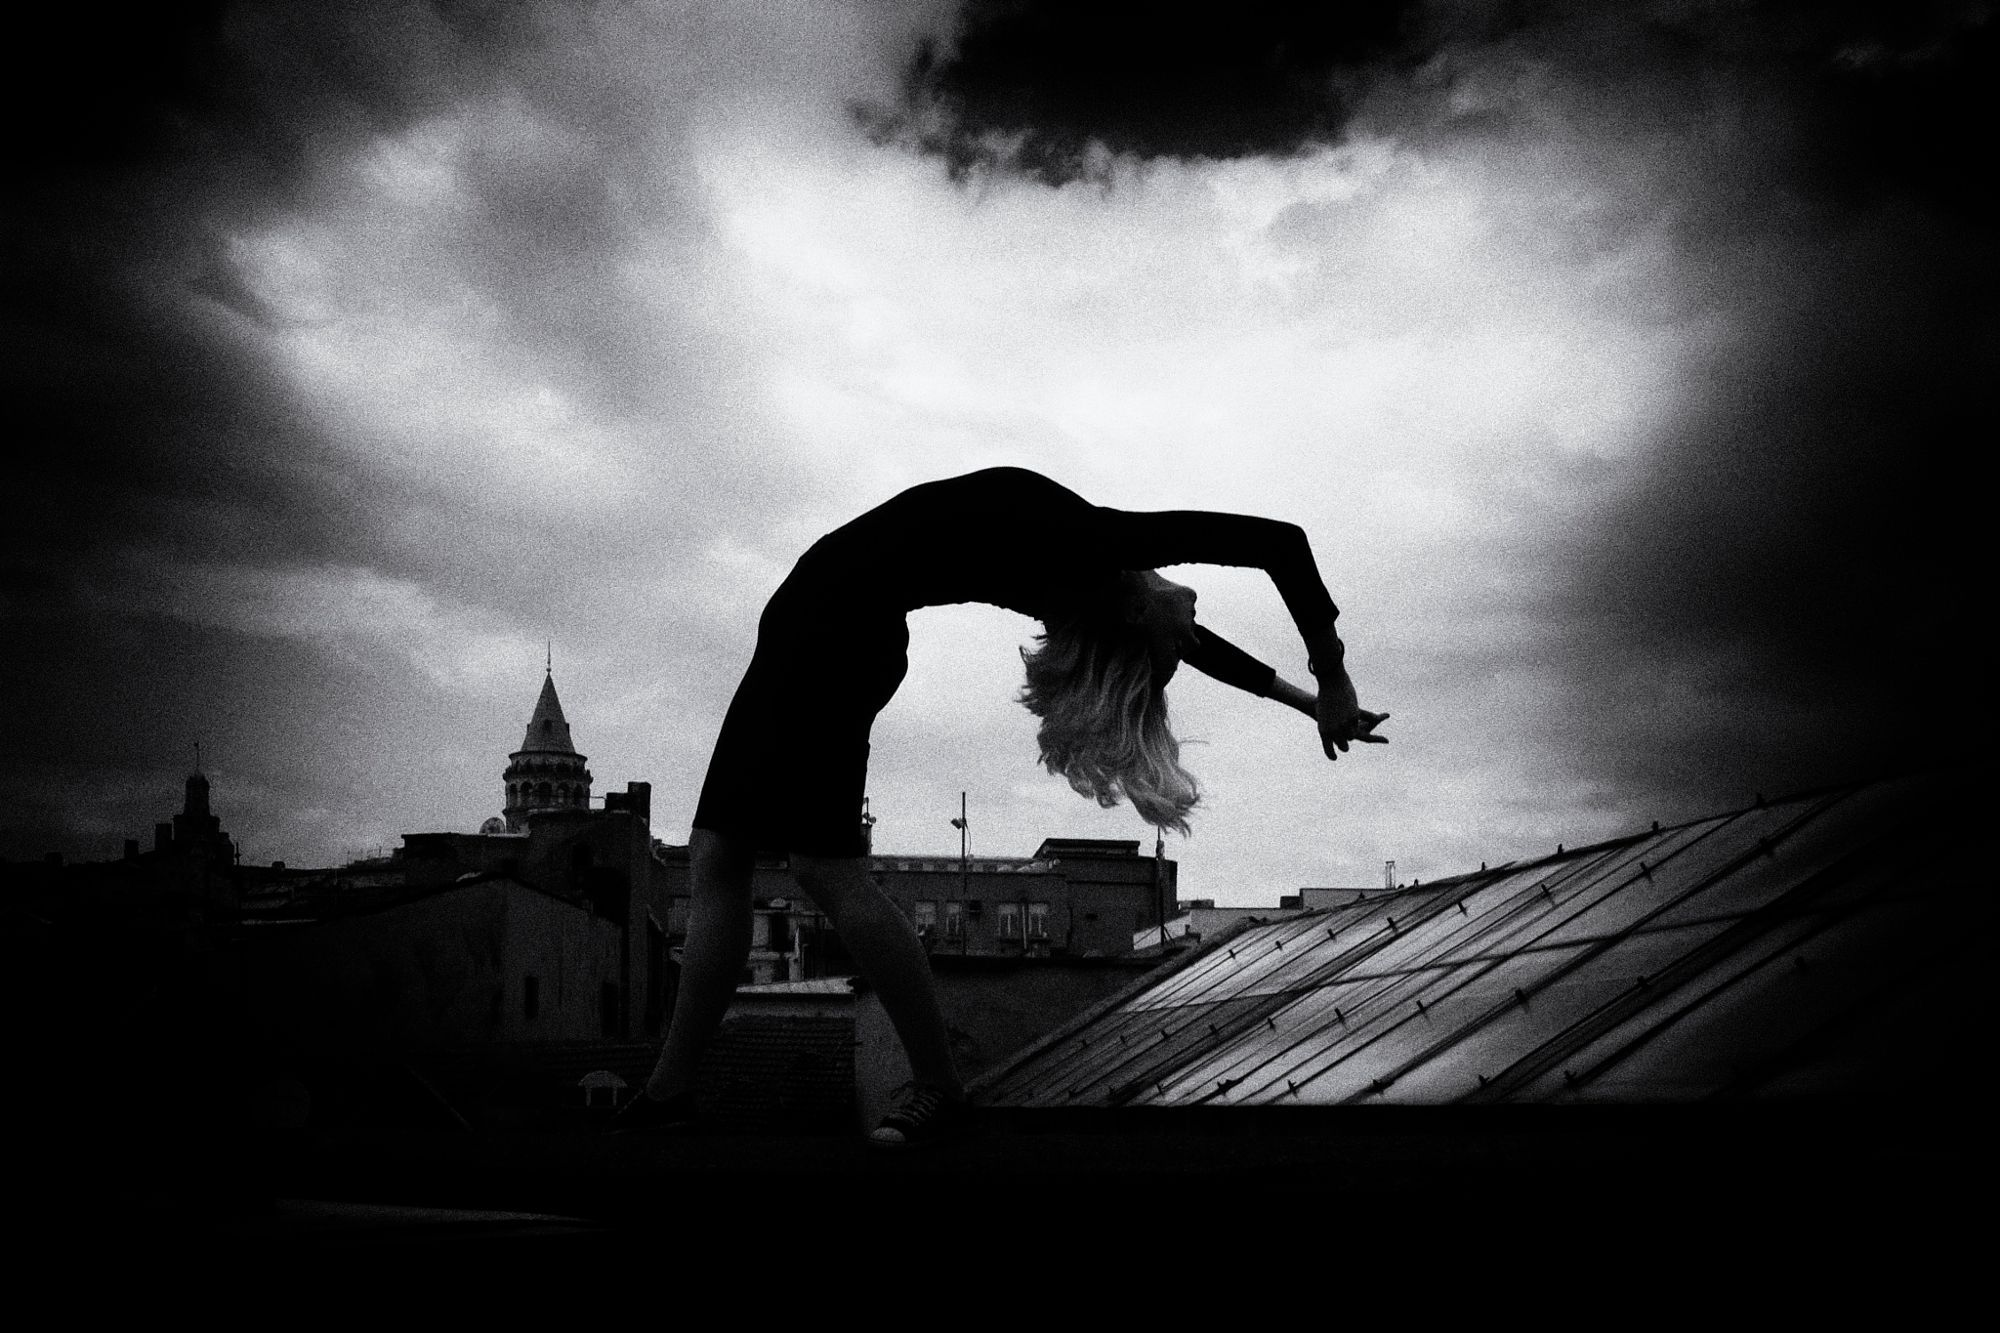 Bending ... by Imge Ildem - Photo 175358507 / 500px.  #500px #blackandwhite #schwarzweiss #noiretblanc #siyahbeyaz #monochrome #beauty #bw #turkey #woman #creative #body #dark #bnw #galatatower #galatakulesi #pose #clouds #sky #augsburg #ulm #münchen #stuttgart #frankfurt #istanbul #ankara #izmir